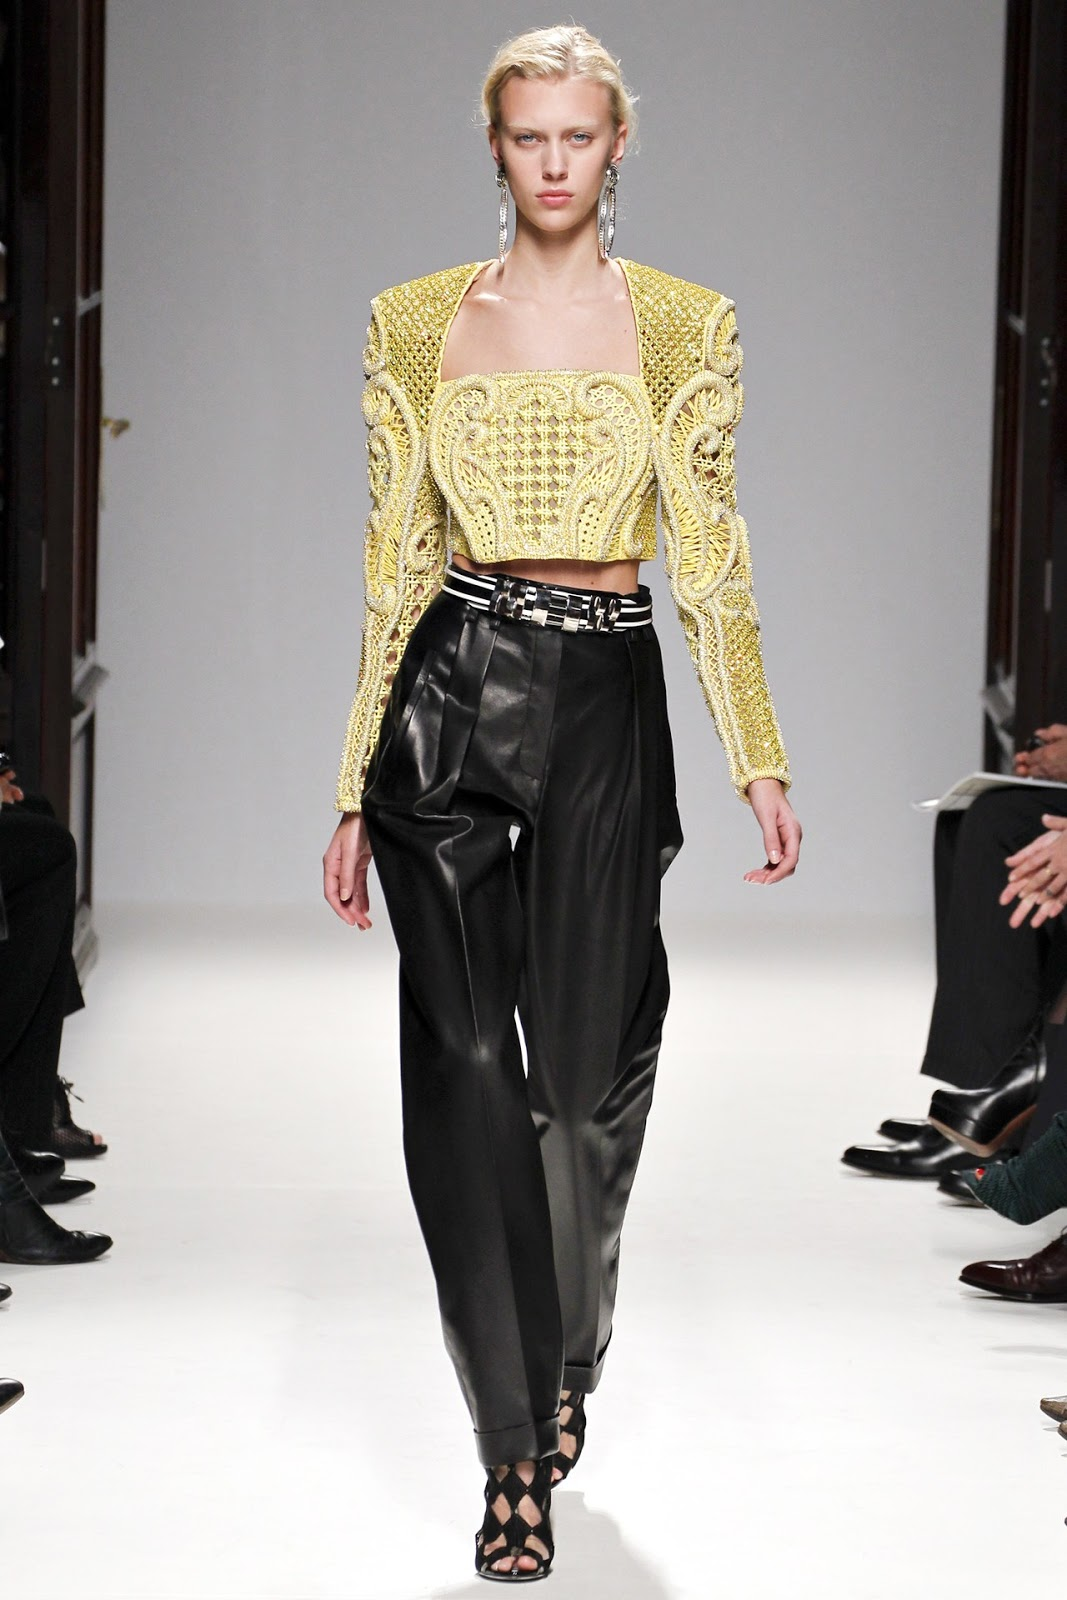 http://3.bp.blogspot.com/-gEH1lwX74ds/UHrr93Rro9I/AAAAAAAA8cY/S-Q7I38etKQ/s1600/Paris+Fashion+Week+-+Balmain+(Spring-Summer+2013)+22.jpg